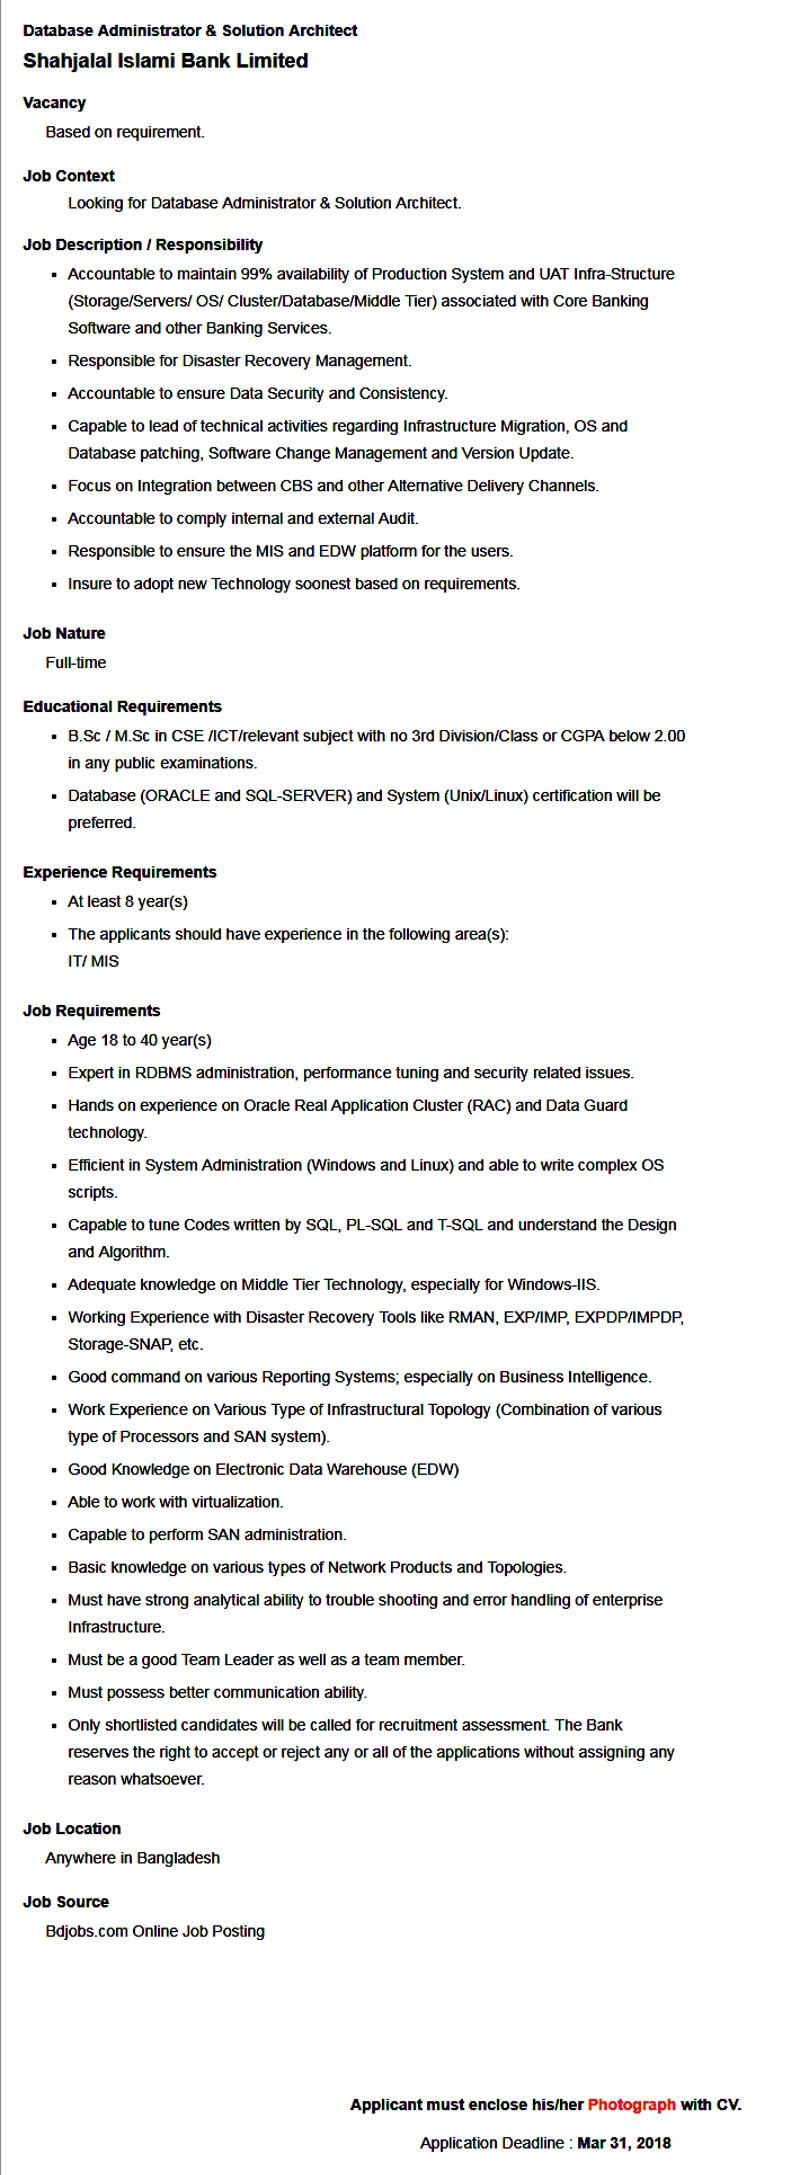 SJIBL Job Circular 2018